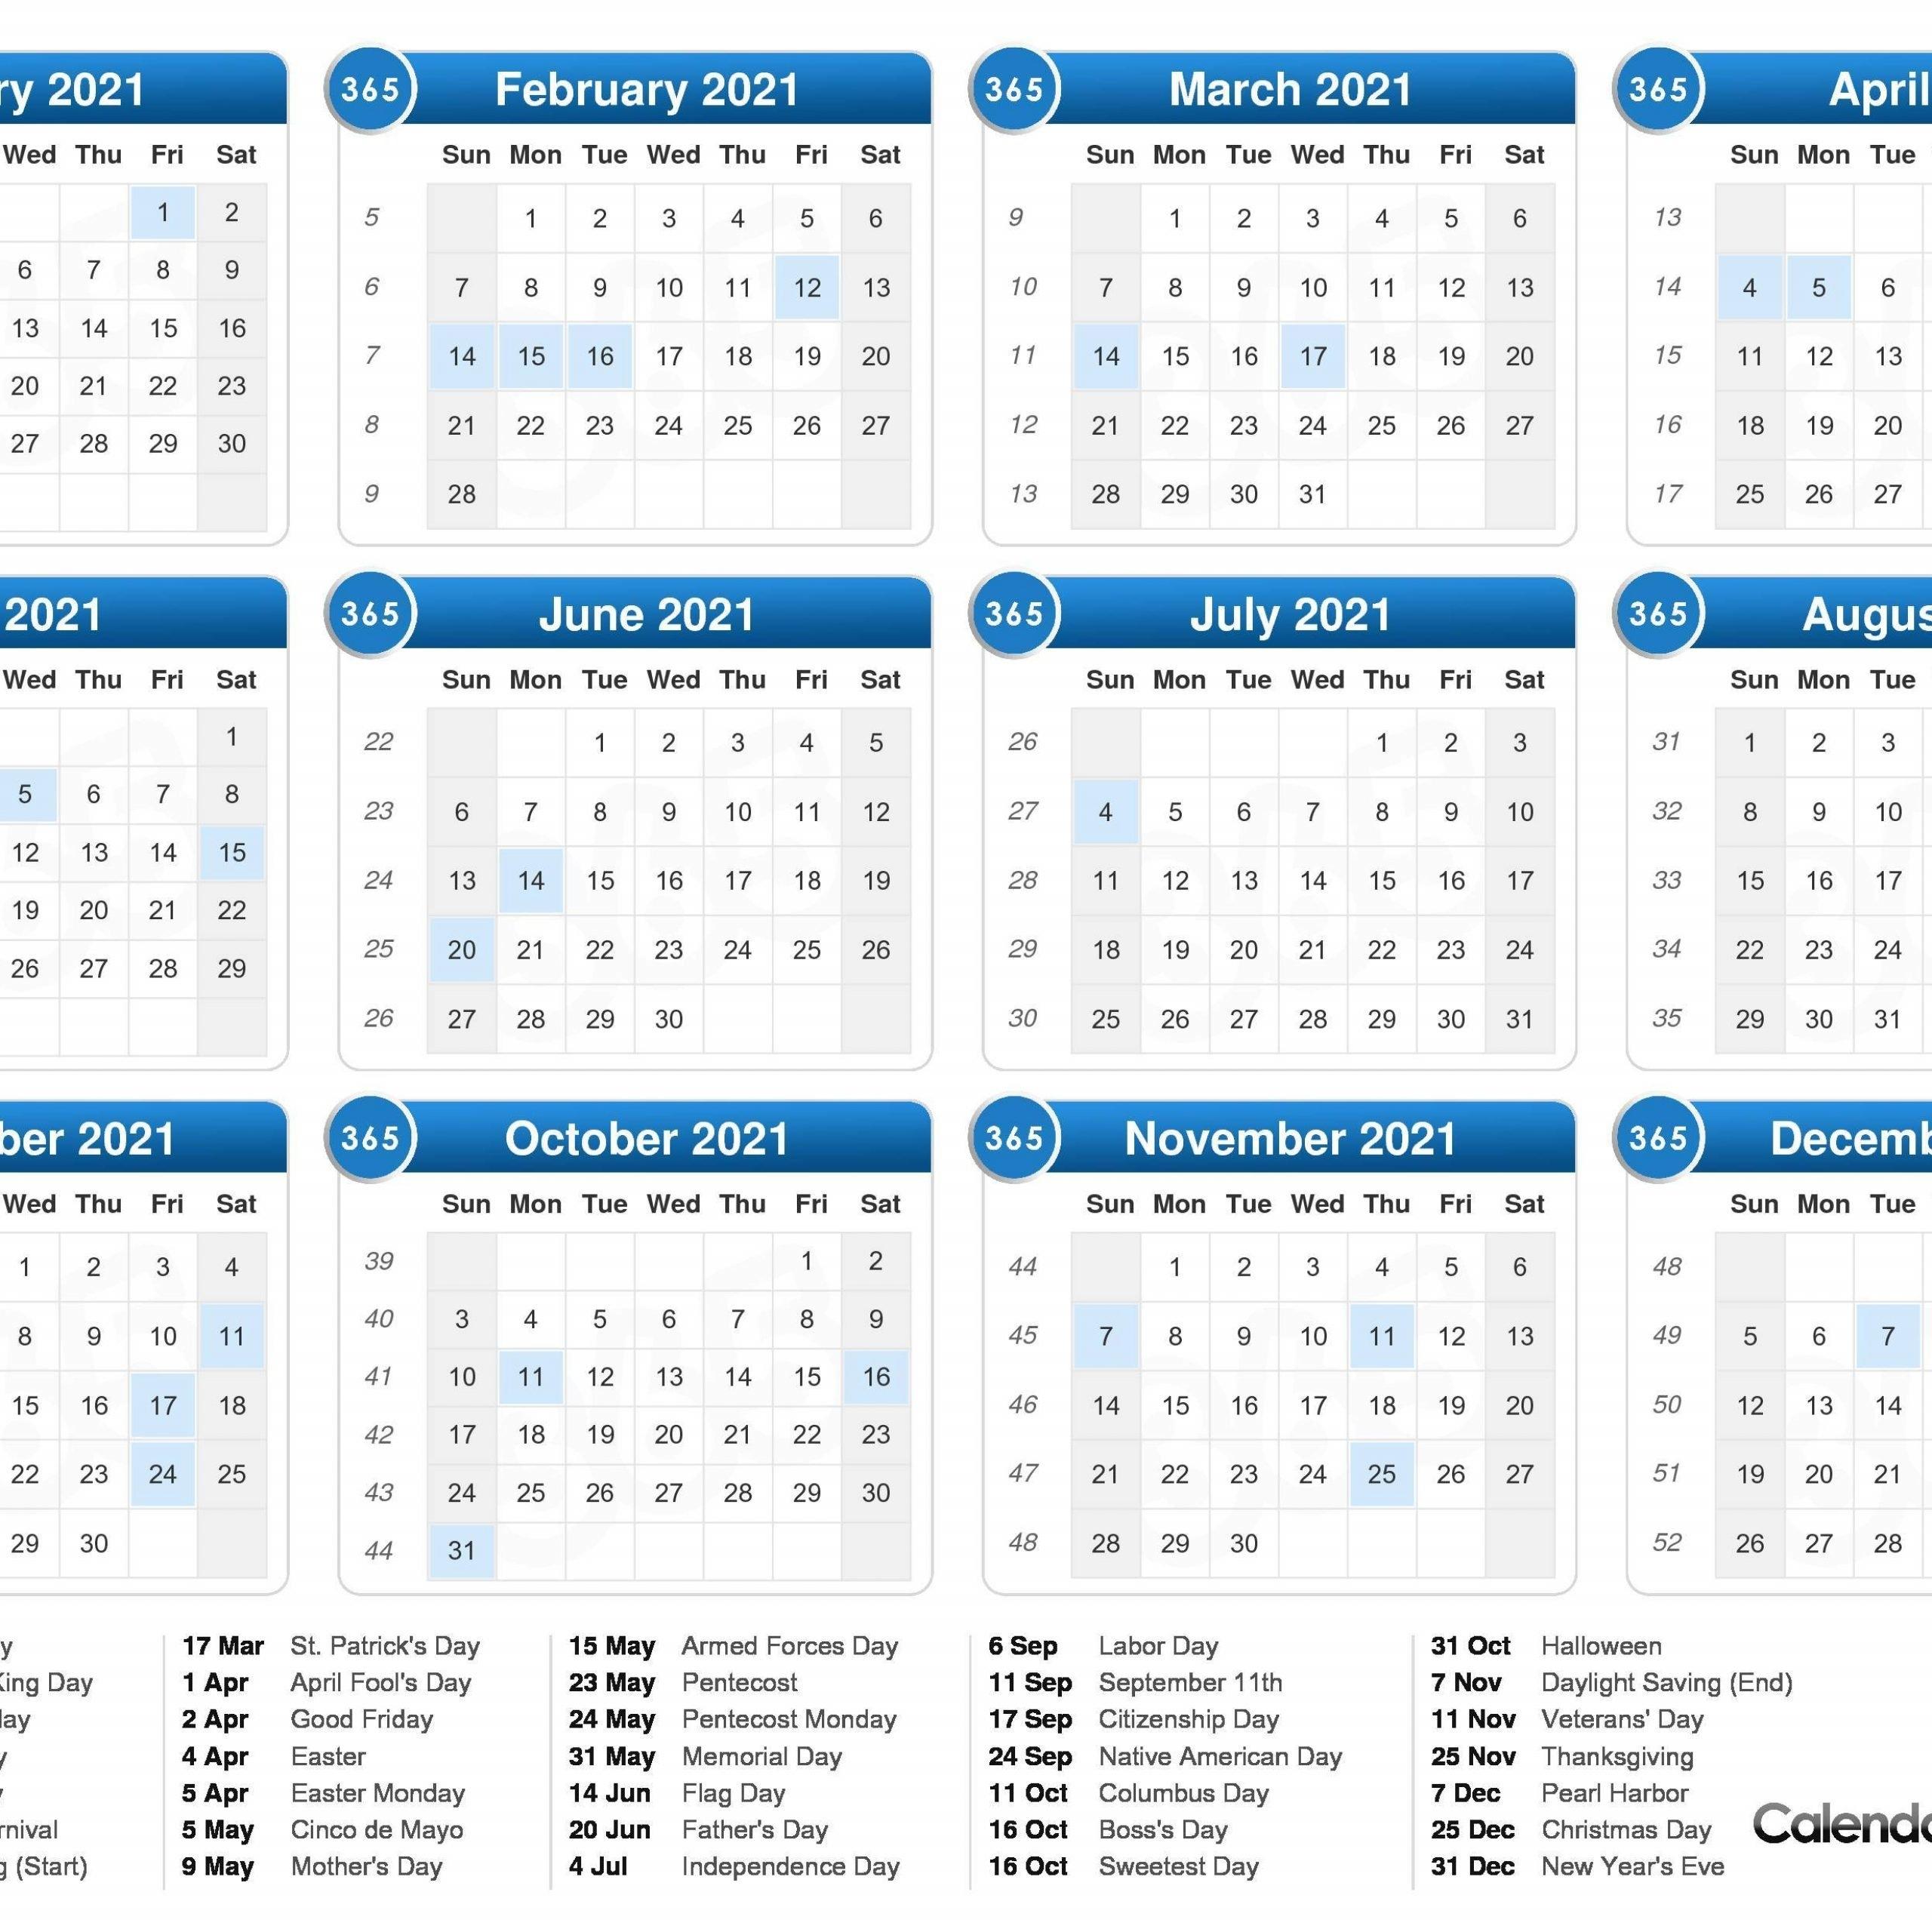 2021 One Page Calendar With Week Numbers | Free Printable Calendar throughout 2021 Julian Calendar Printable Pdf Image